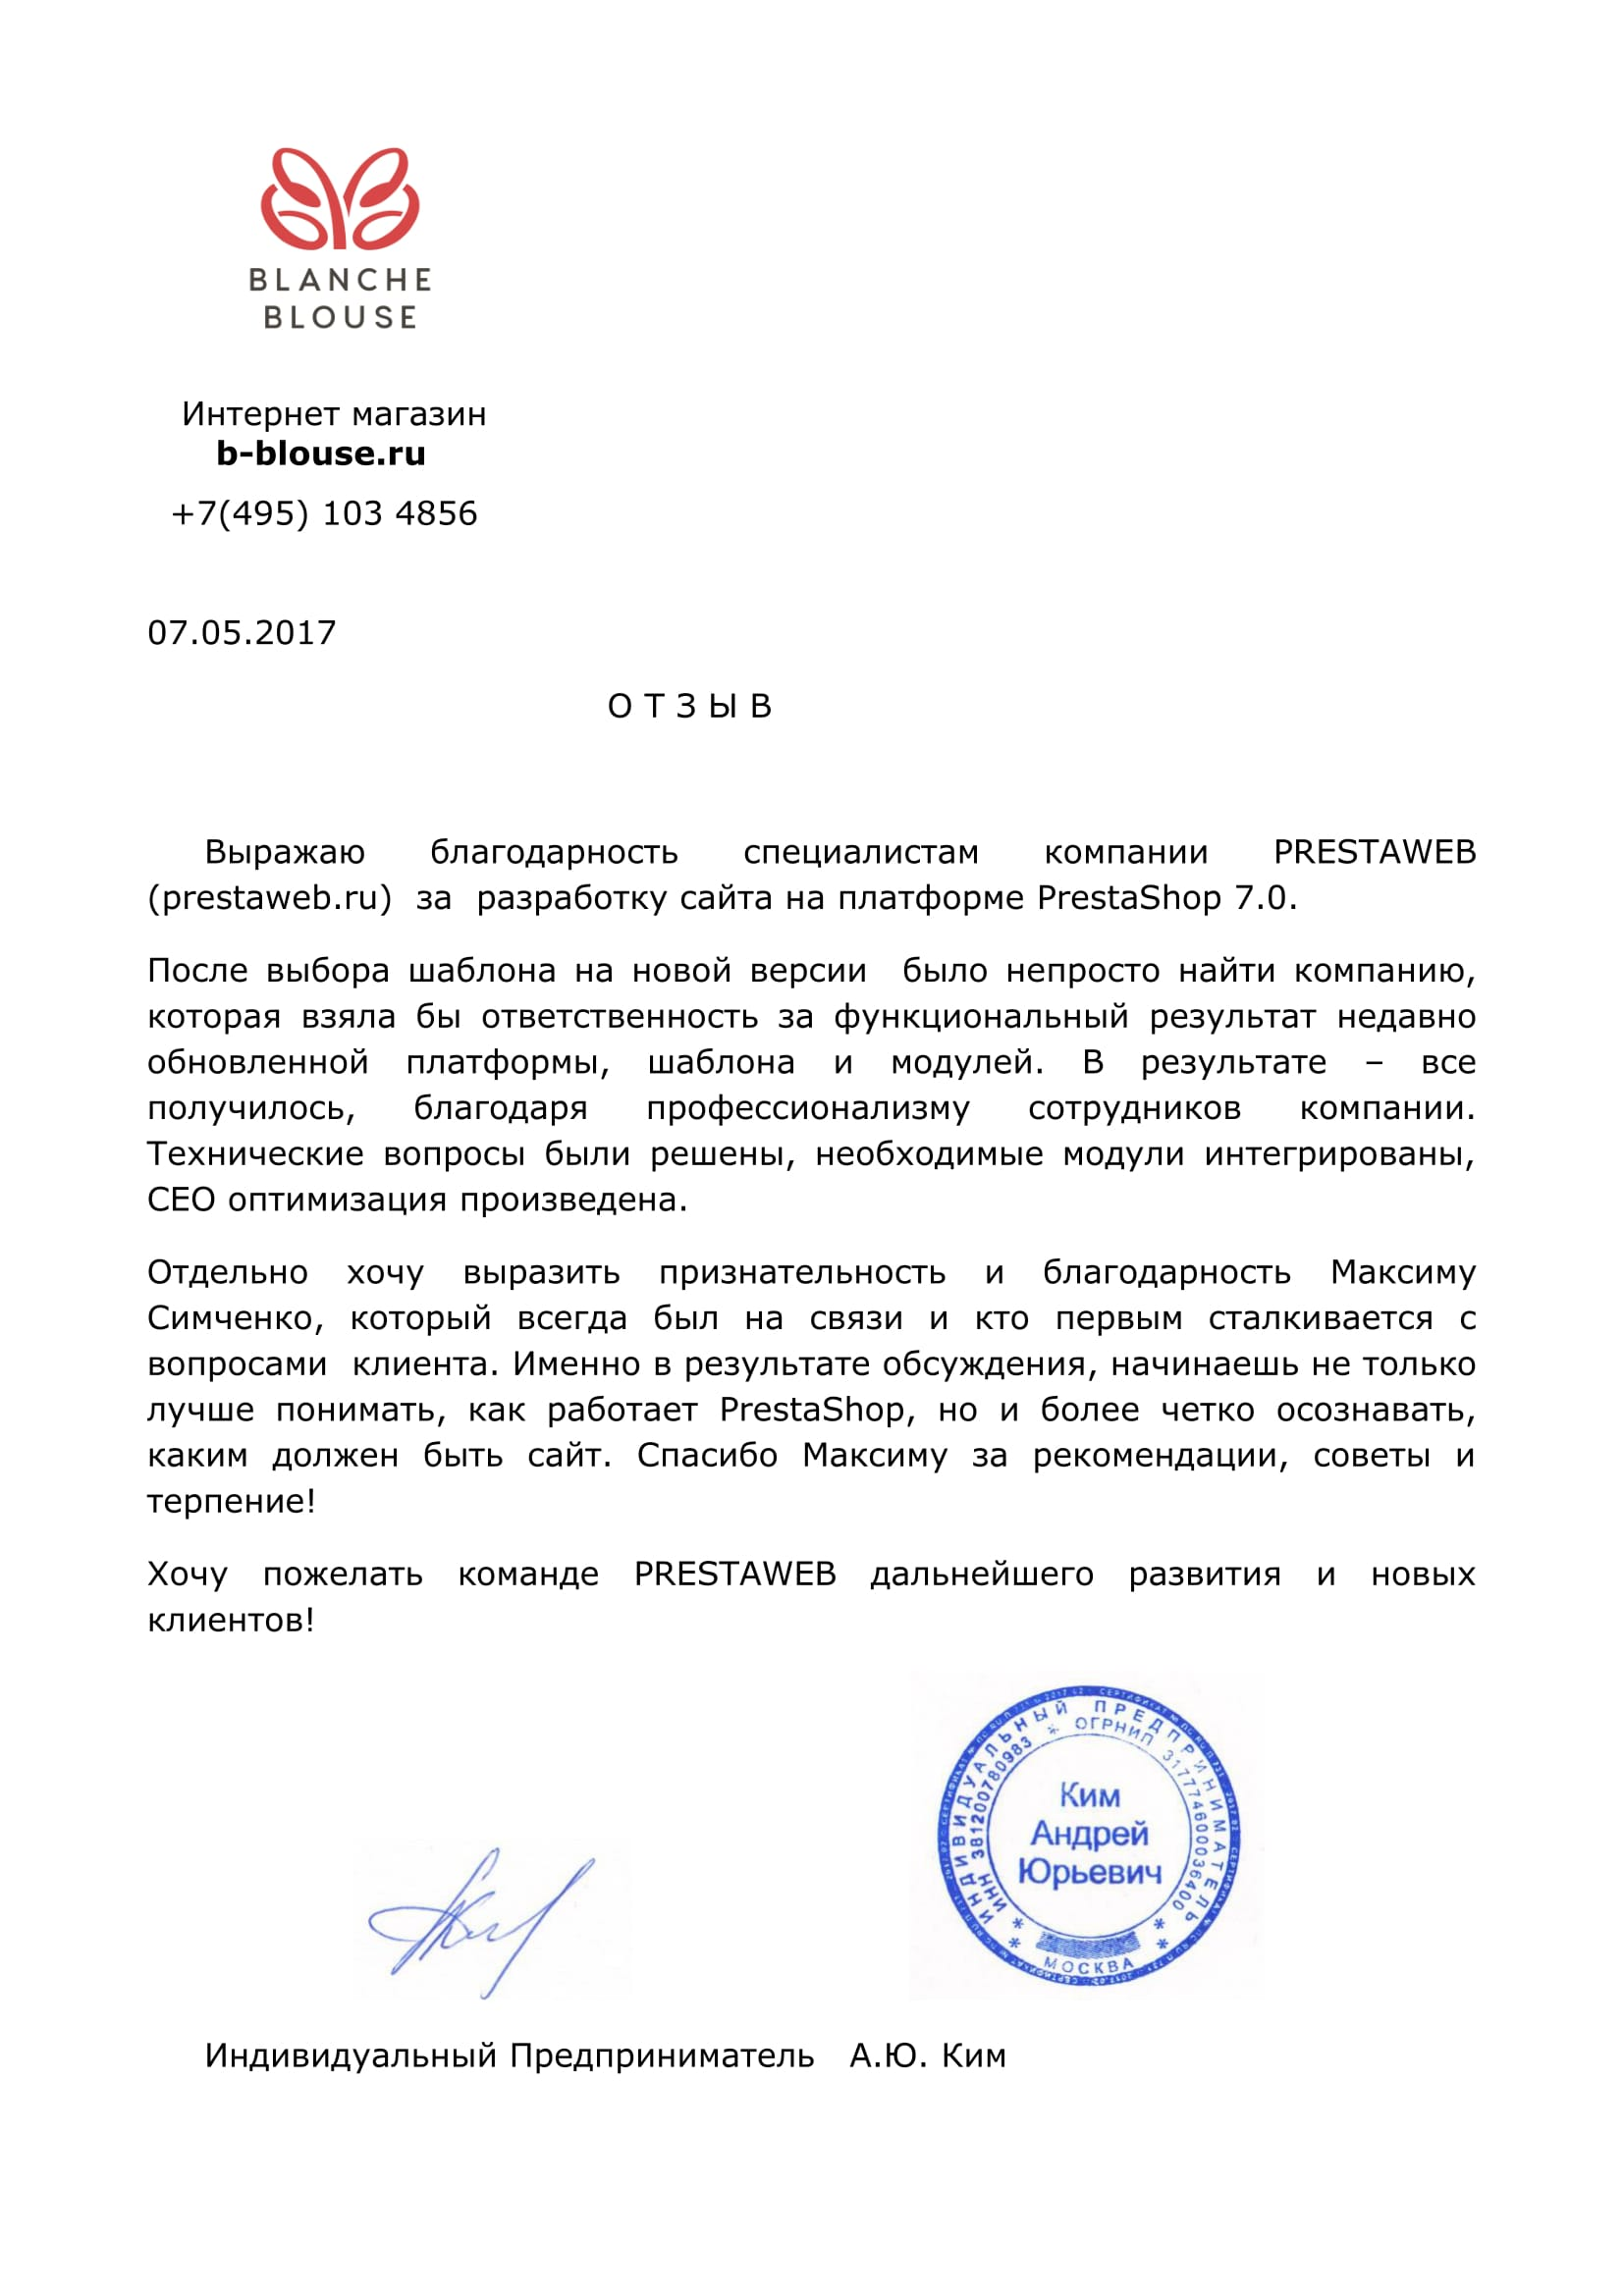 b-blouse.ru